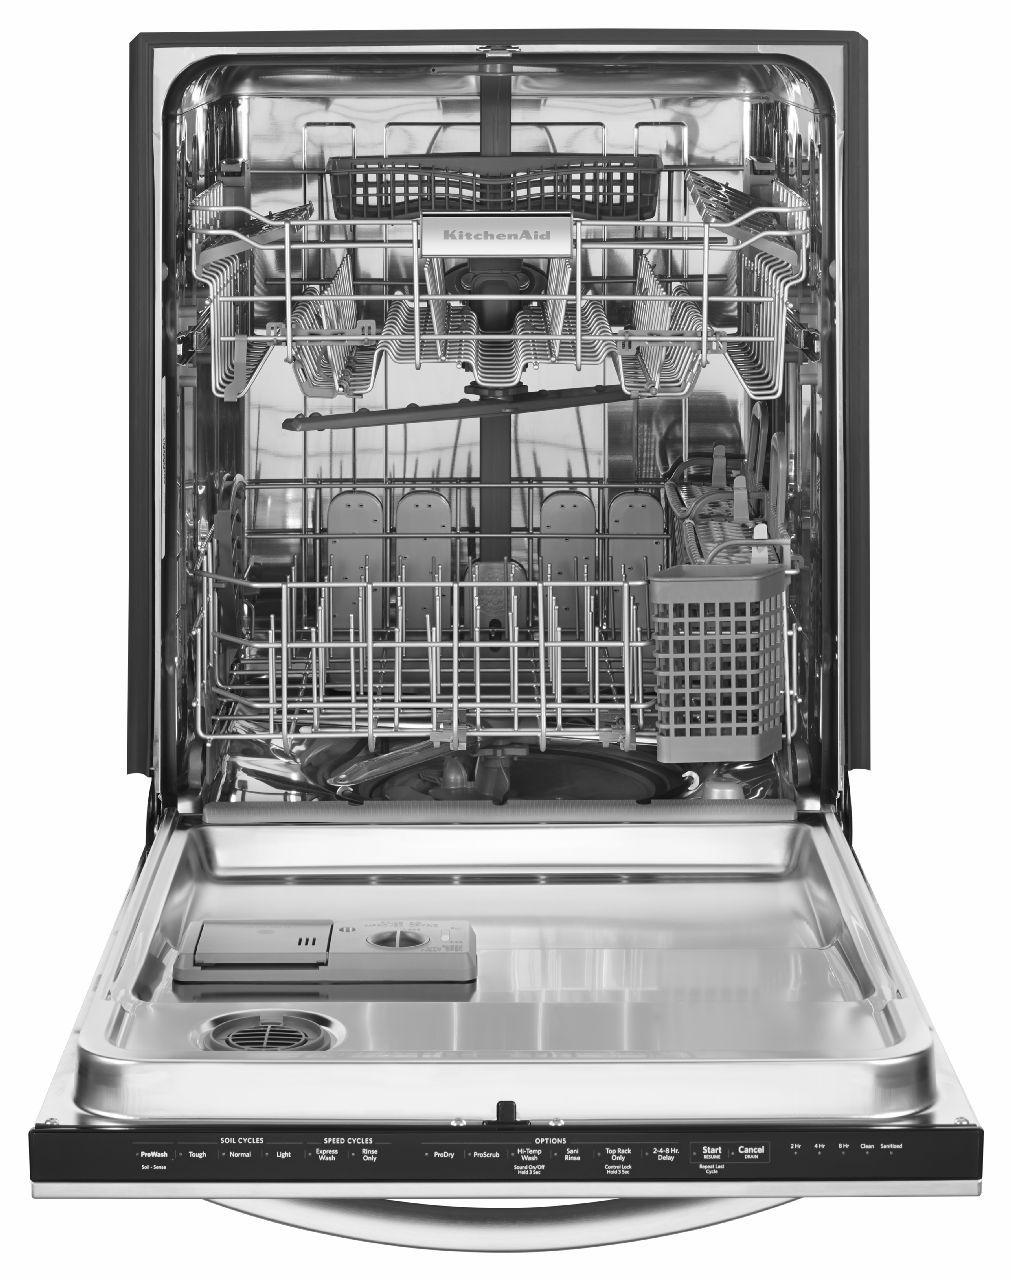 kitchenaid kdtm354dss 2 - Kitchen Aid Dishwashers